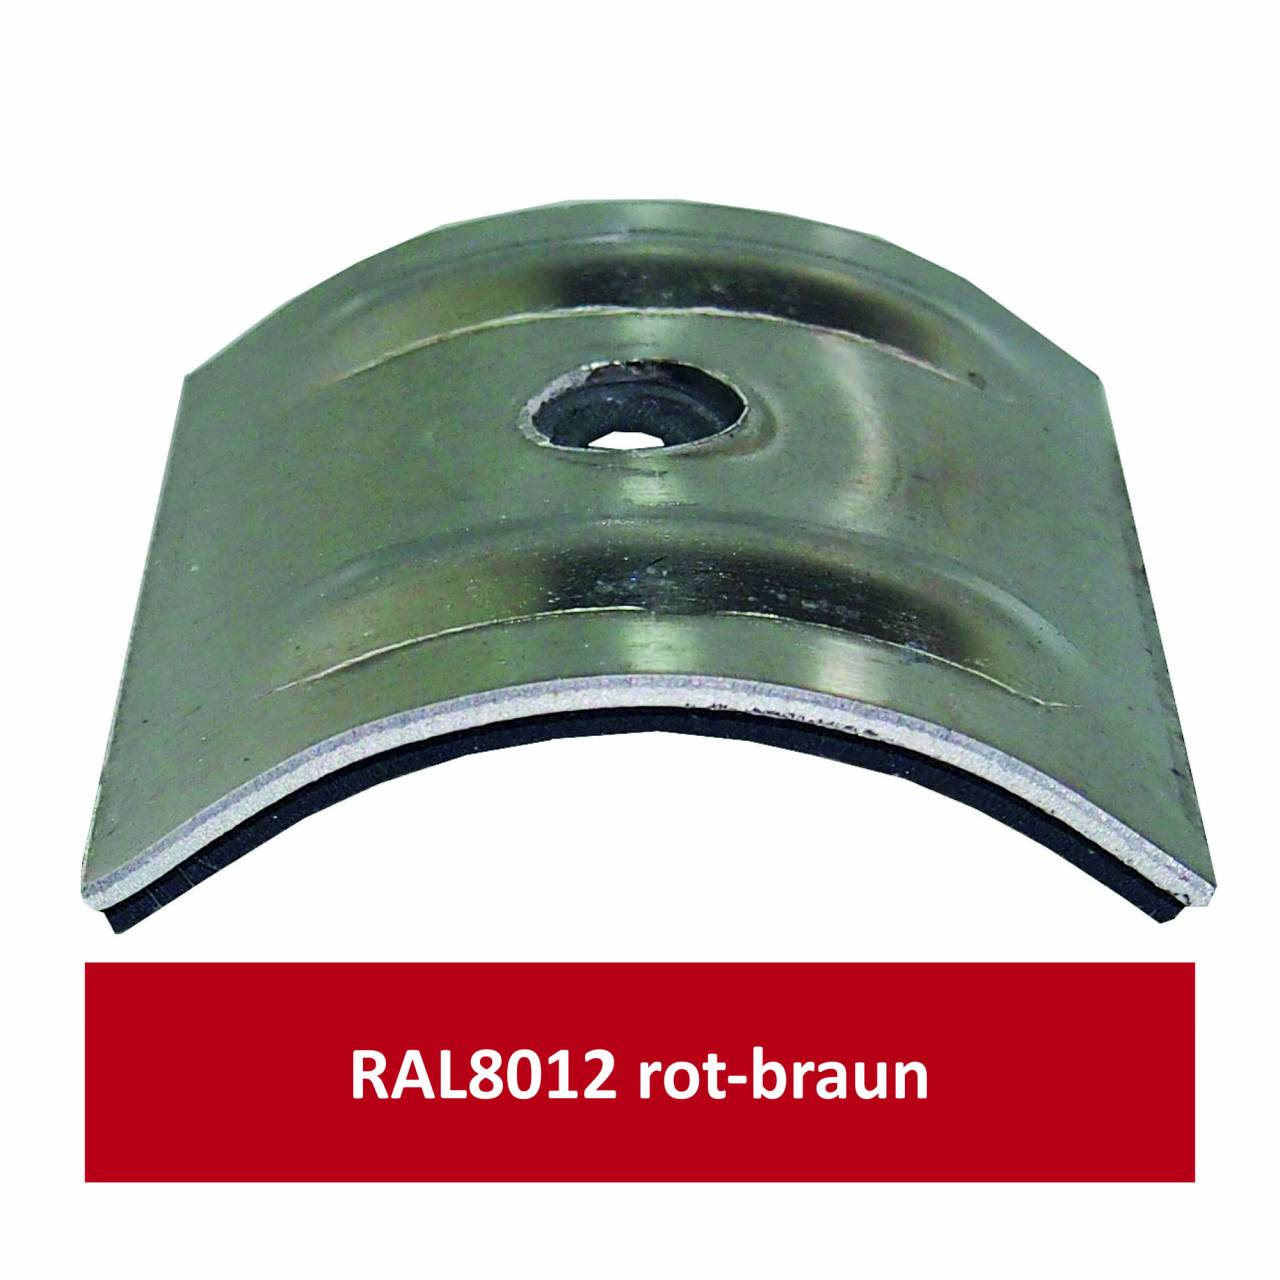 Kalotten für Welle 18/76, Alu RAL8012 rotbraun/ Pck a 100 Stück